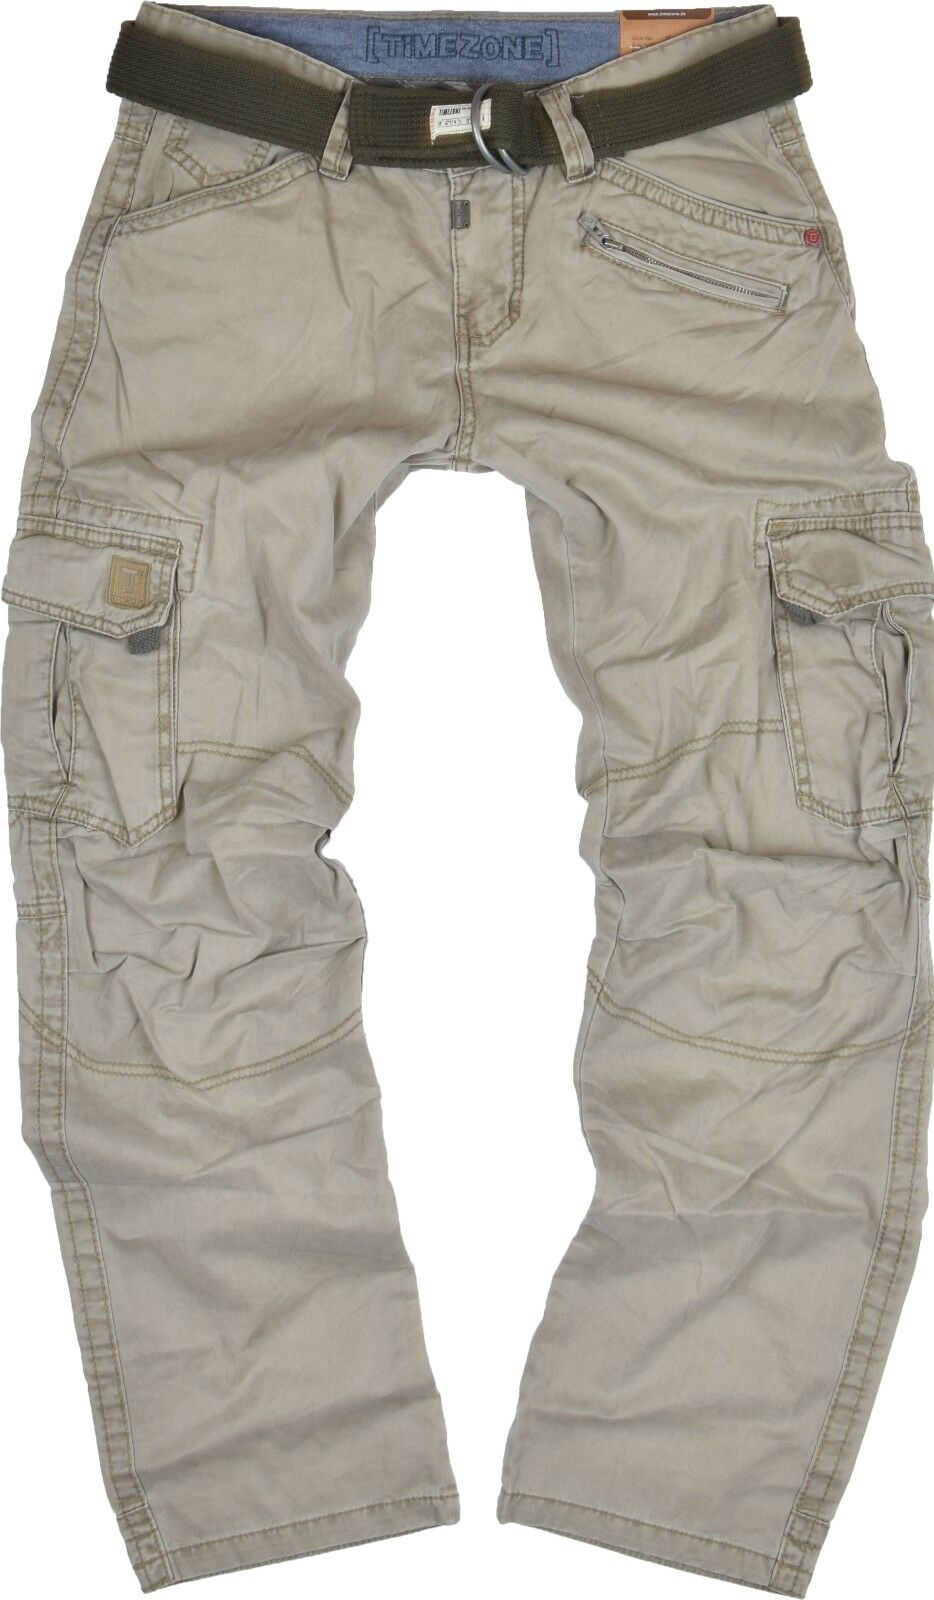 TIMEZONE Uomo Cargo Pant Benito 6166 6166 6166 colorei sabbia Loose Fit Cargo Pant Nuovo 1c2d79